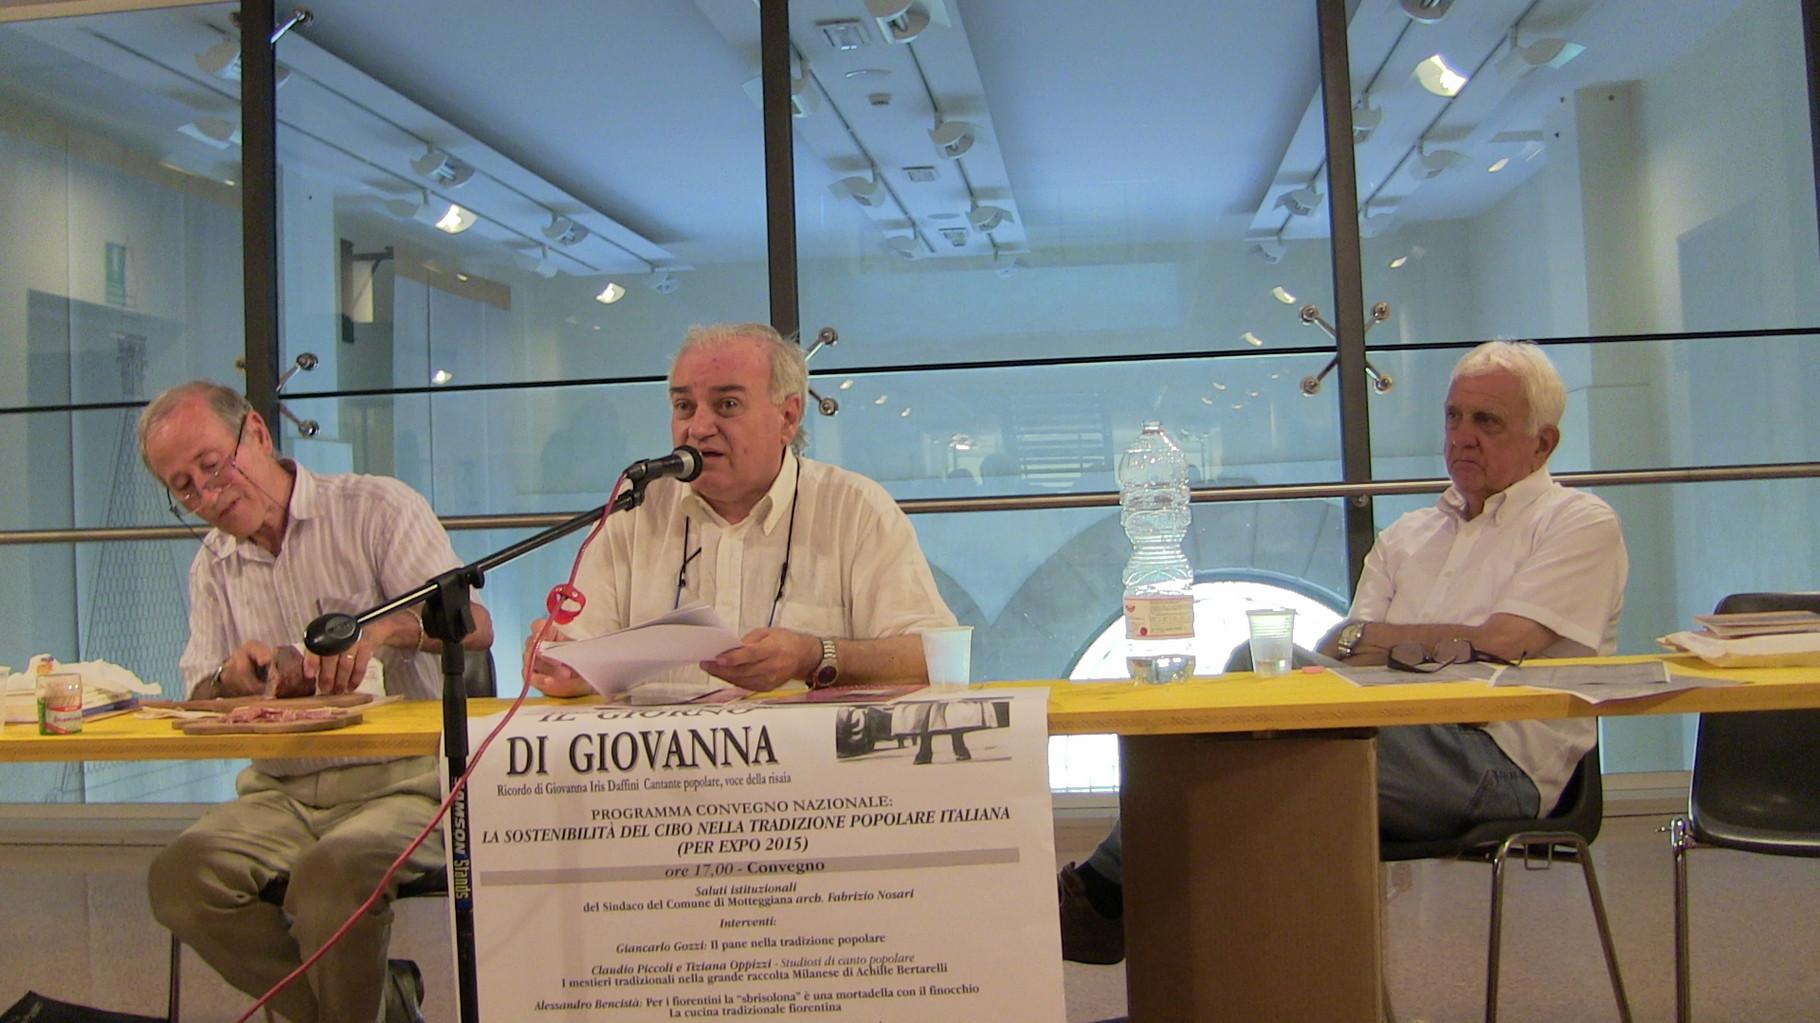 Alessandro Bencistà, Gian Paolo Borghi, Giancarlo Gozzi